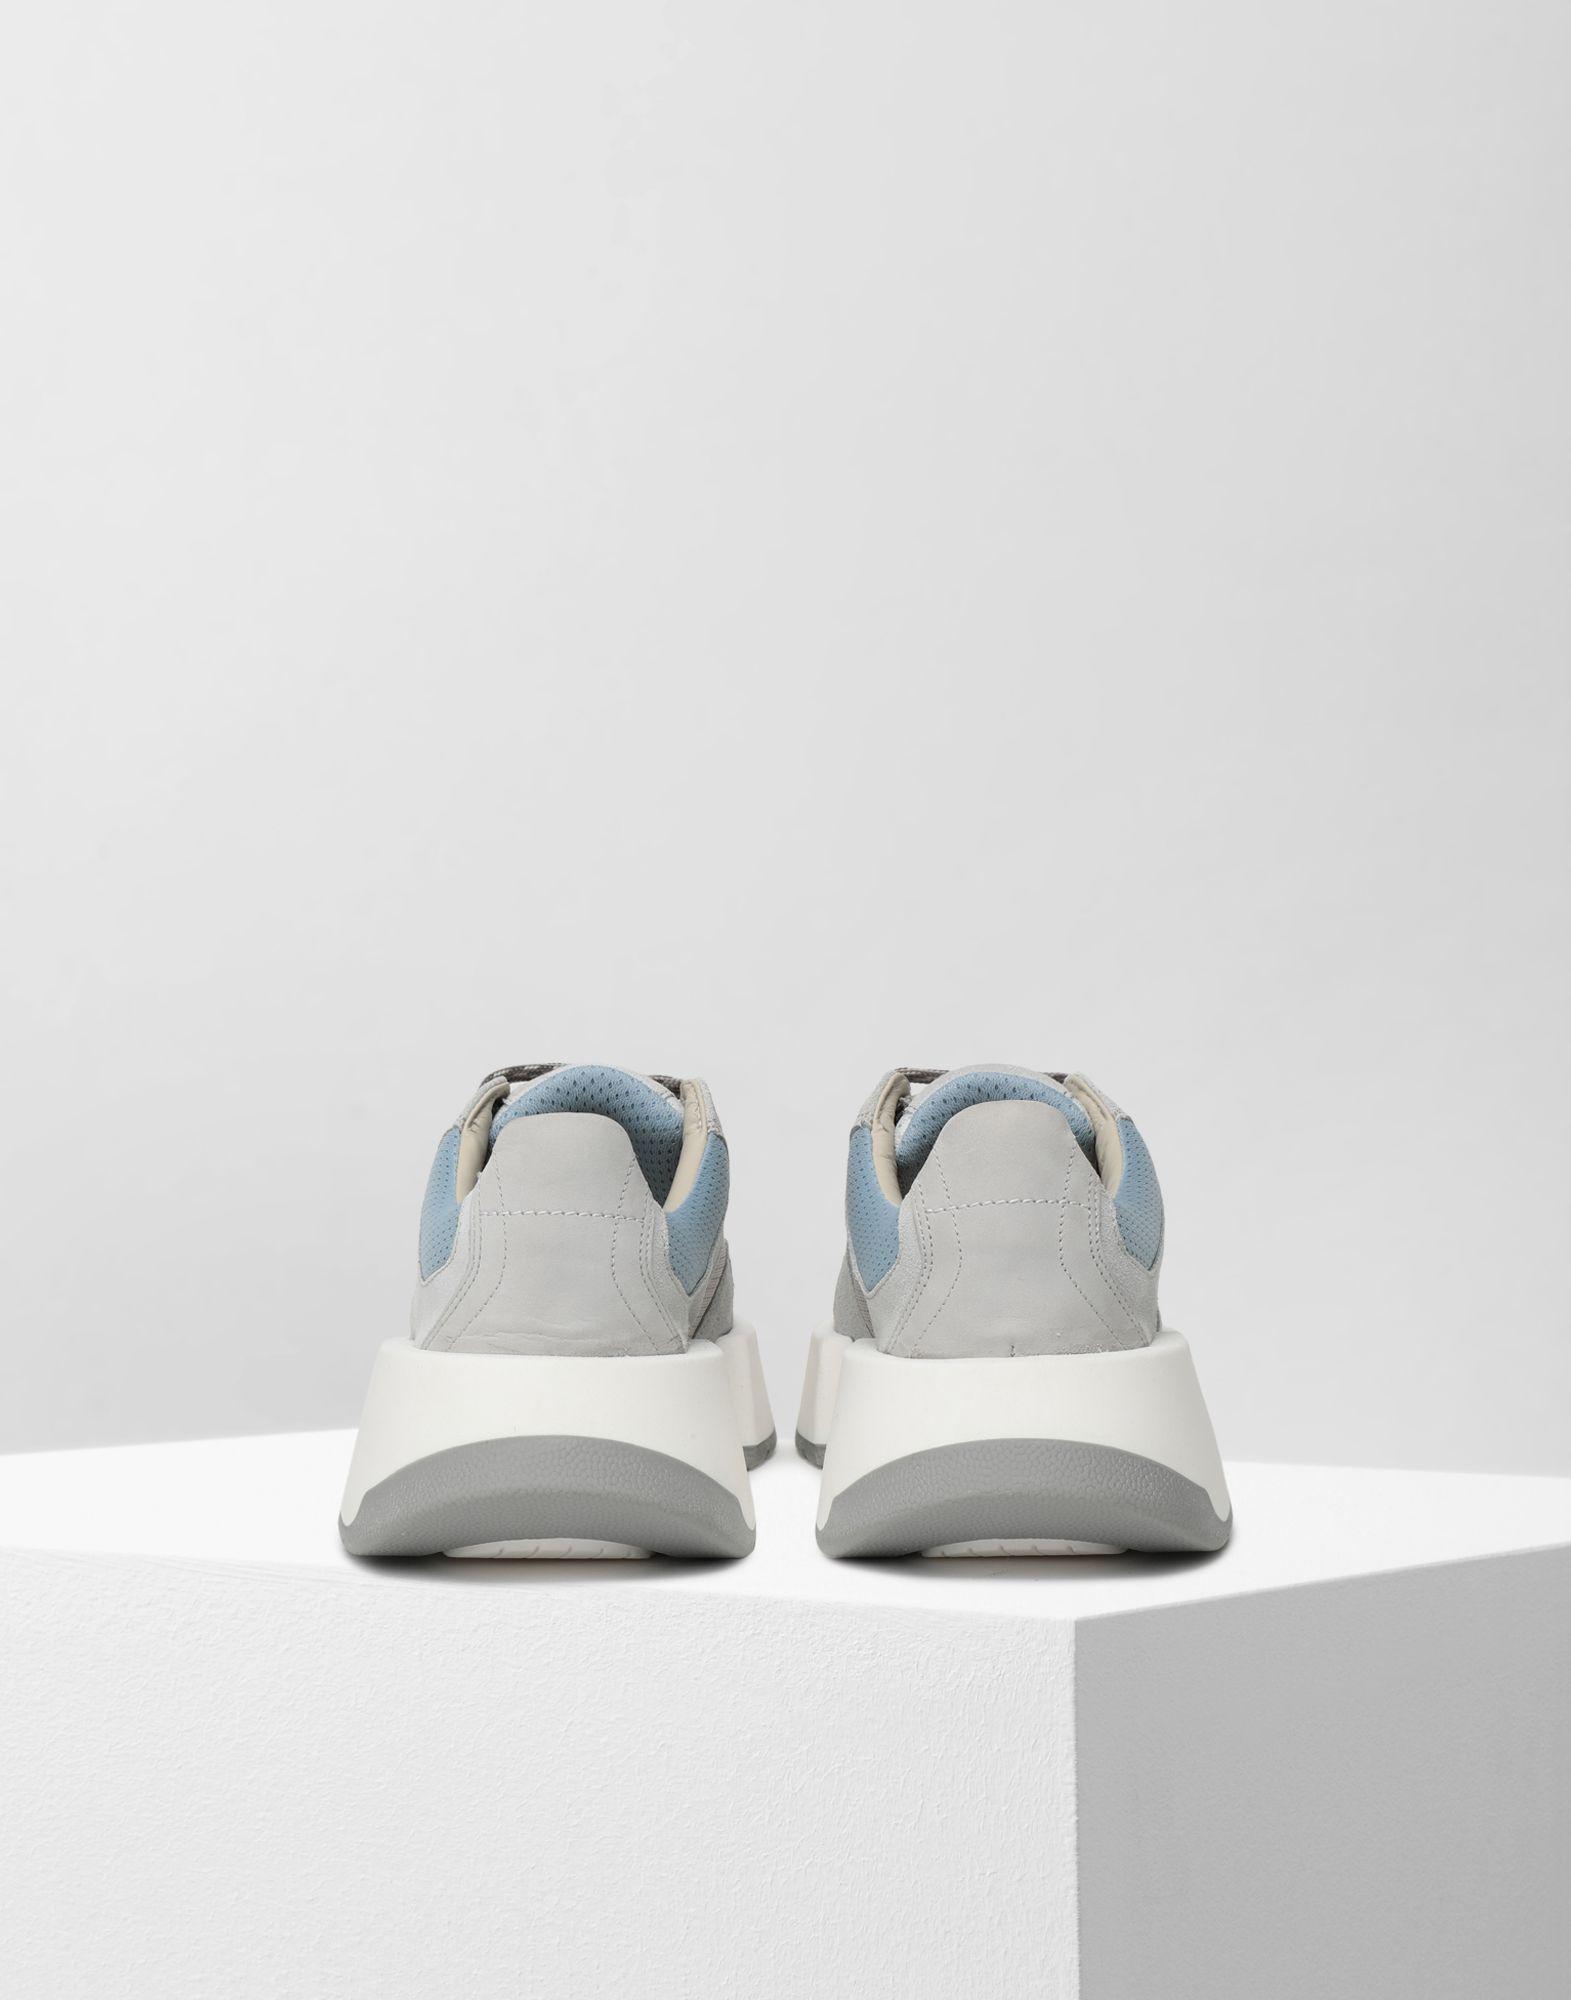 MM6 MAISON MARGIELA Sneakers running en cuir Sneakers Femme d